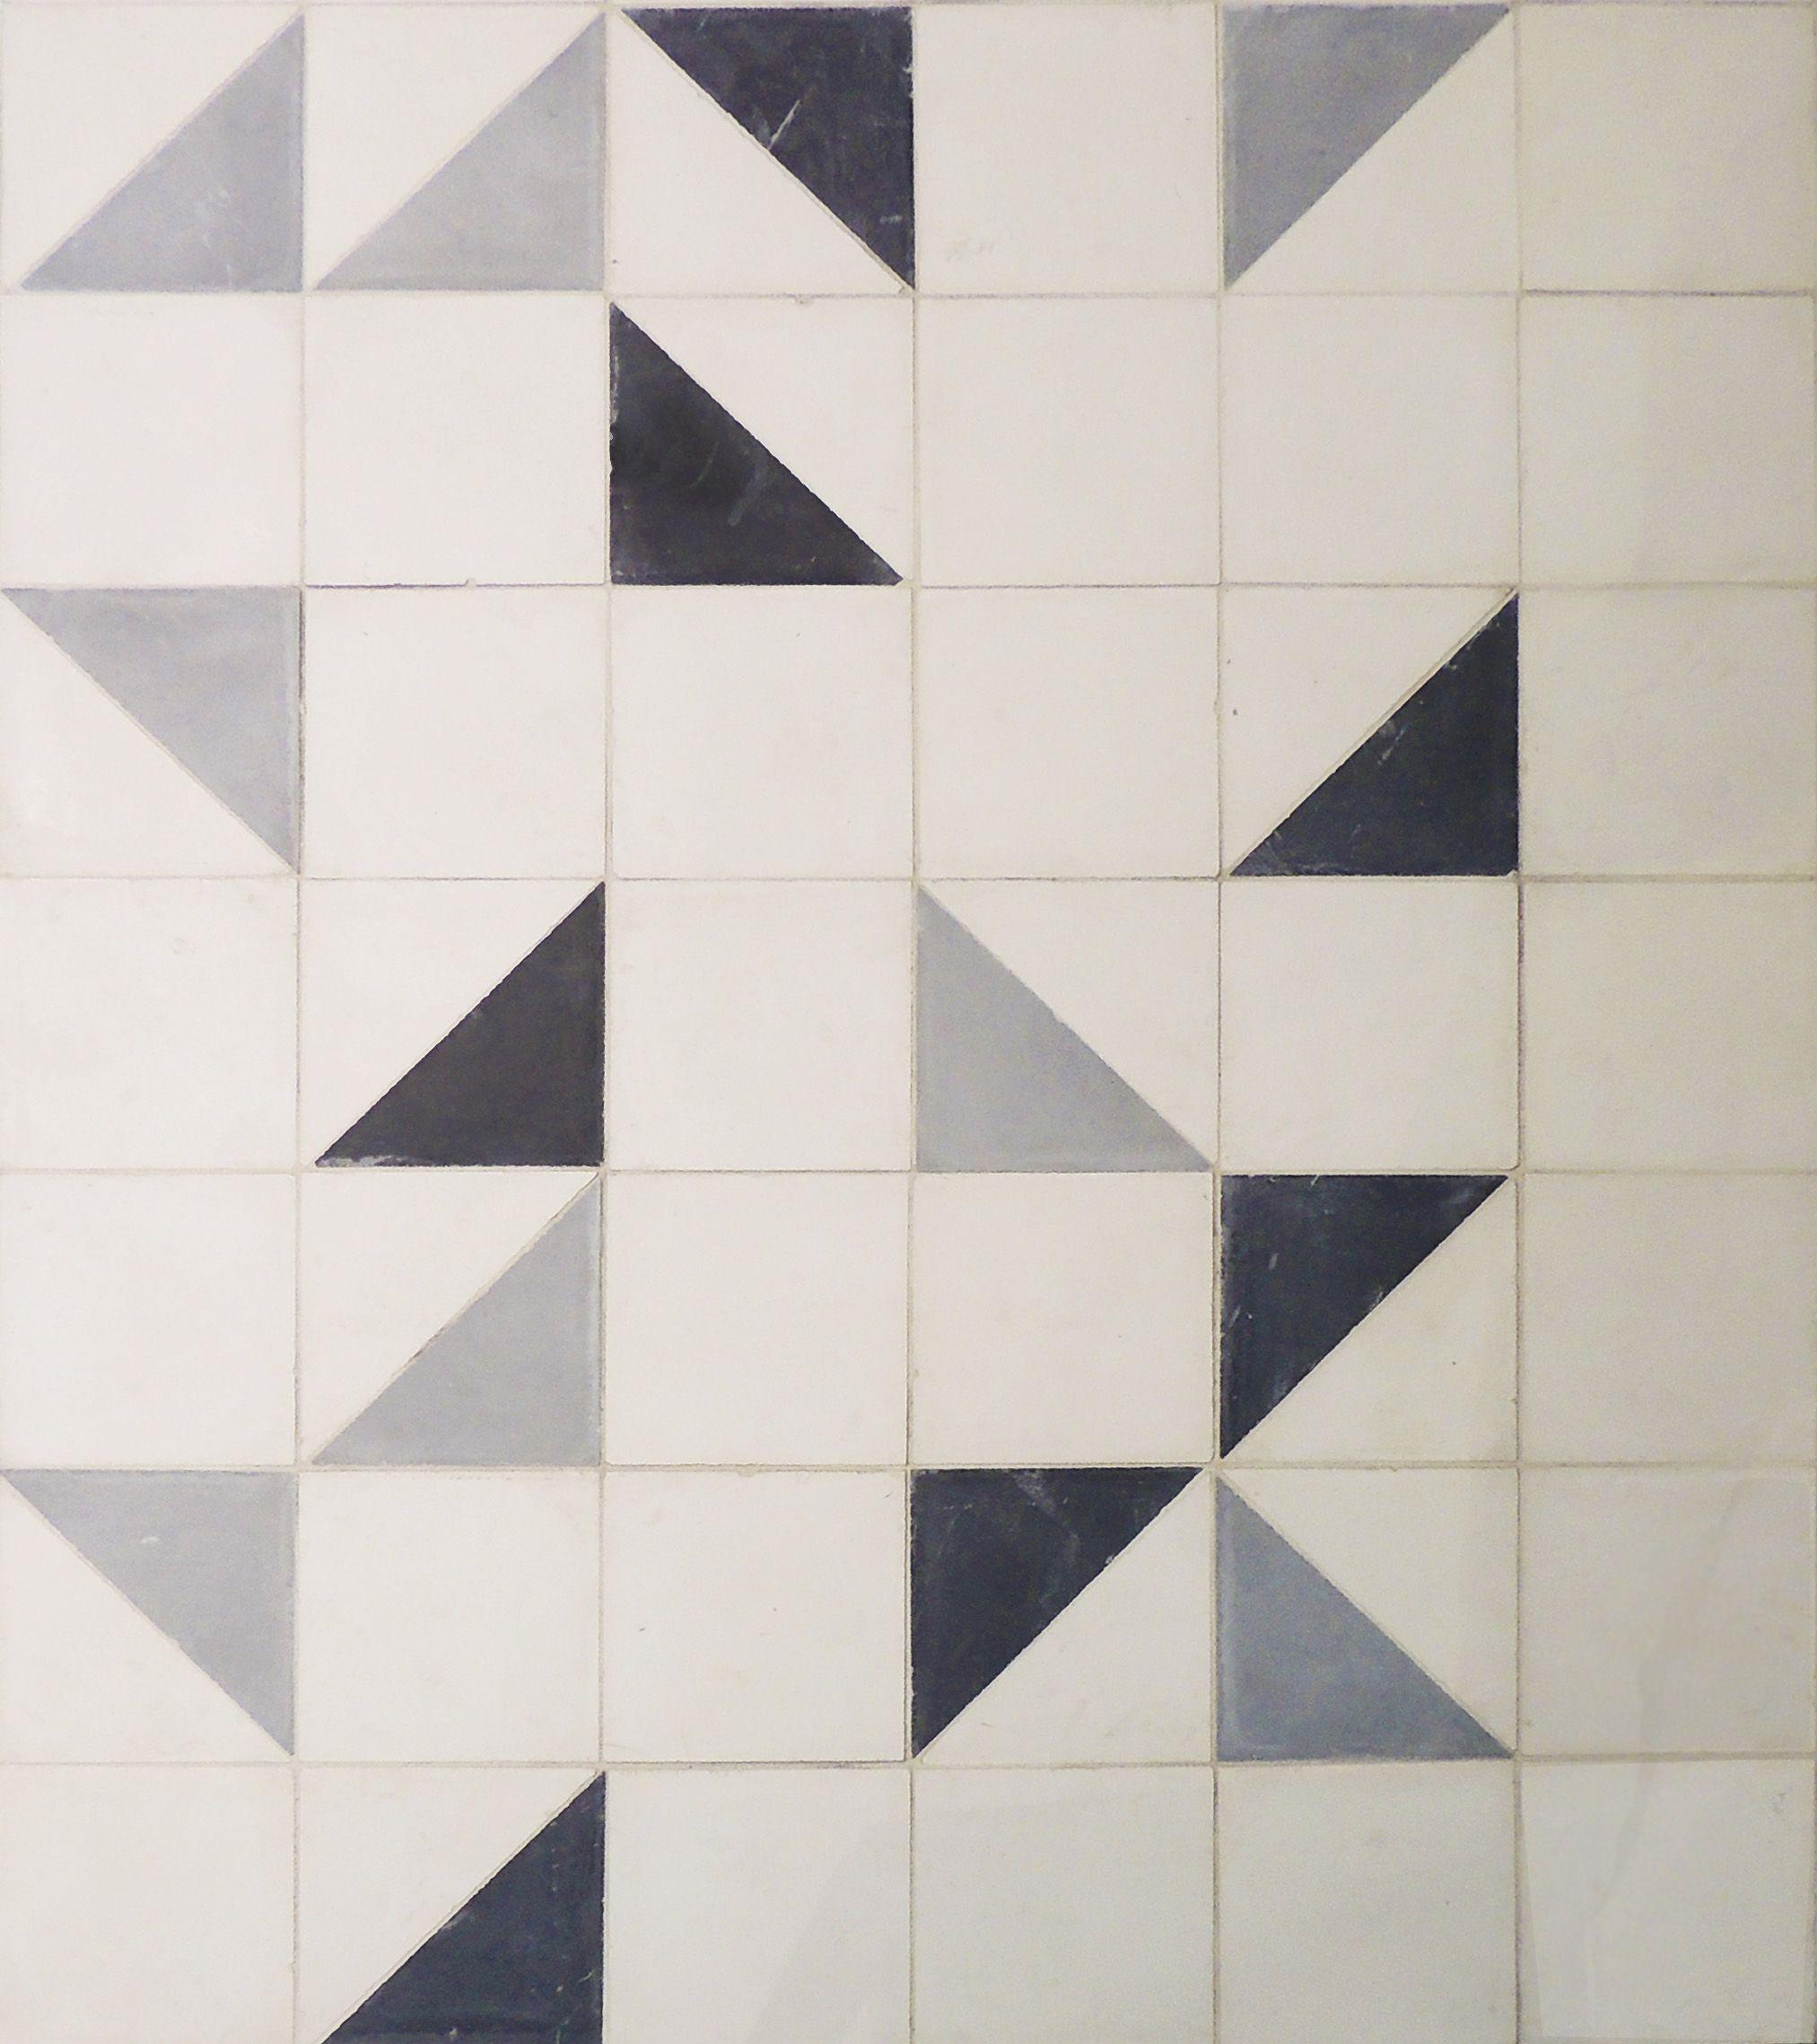 Geometric Floor Strada Cement Tiles In Black Oxford White